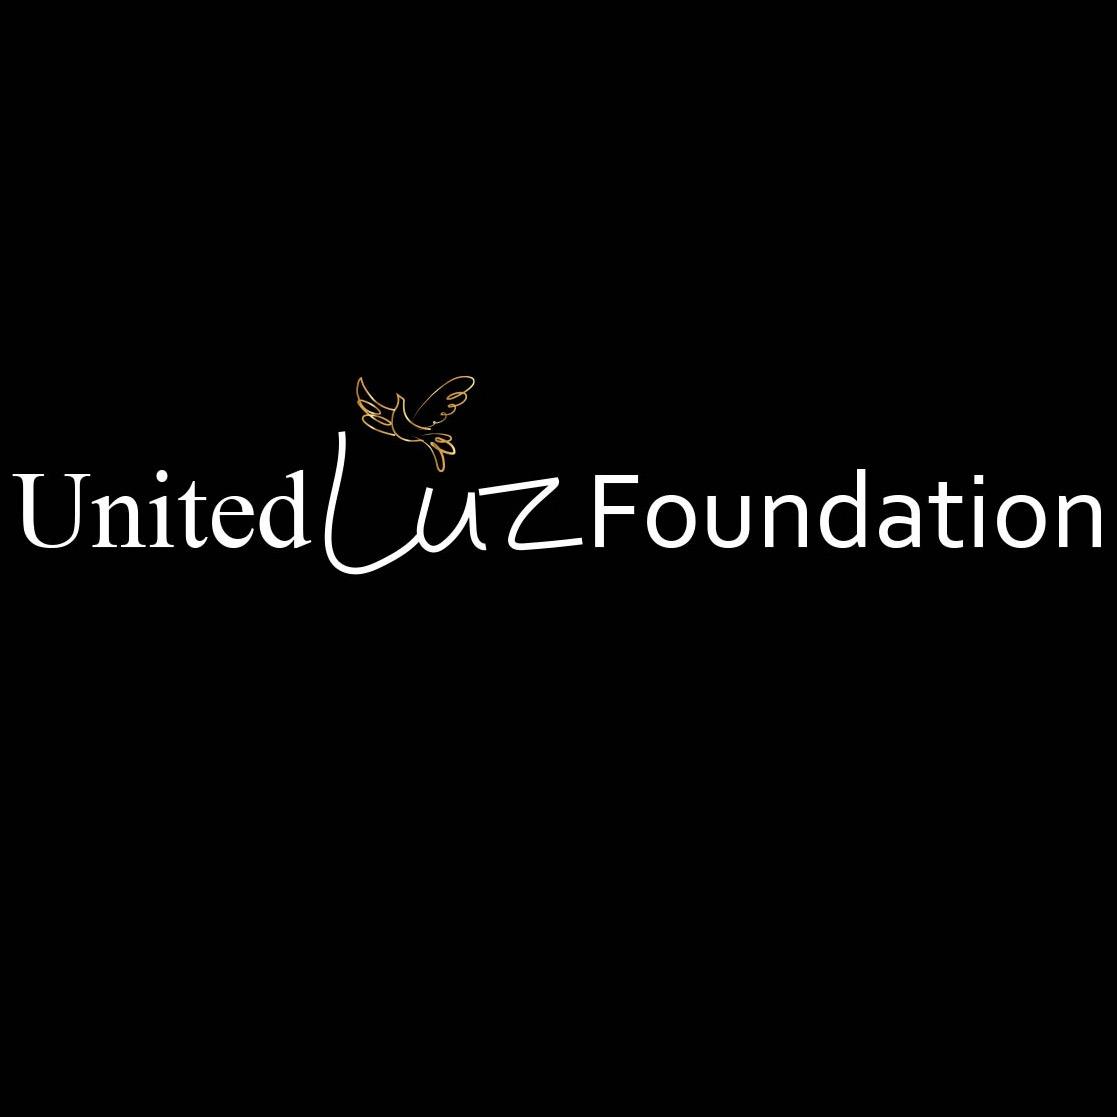 SKY HEAVENS UNITEDLUZFOUNDATION.ORG Link Thumbnail | Linktree